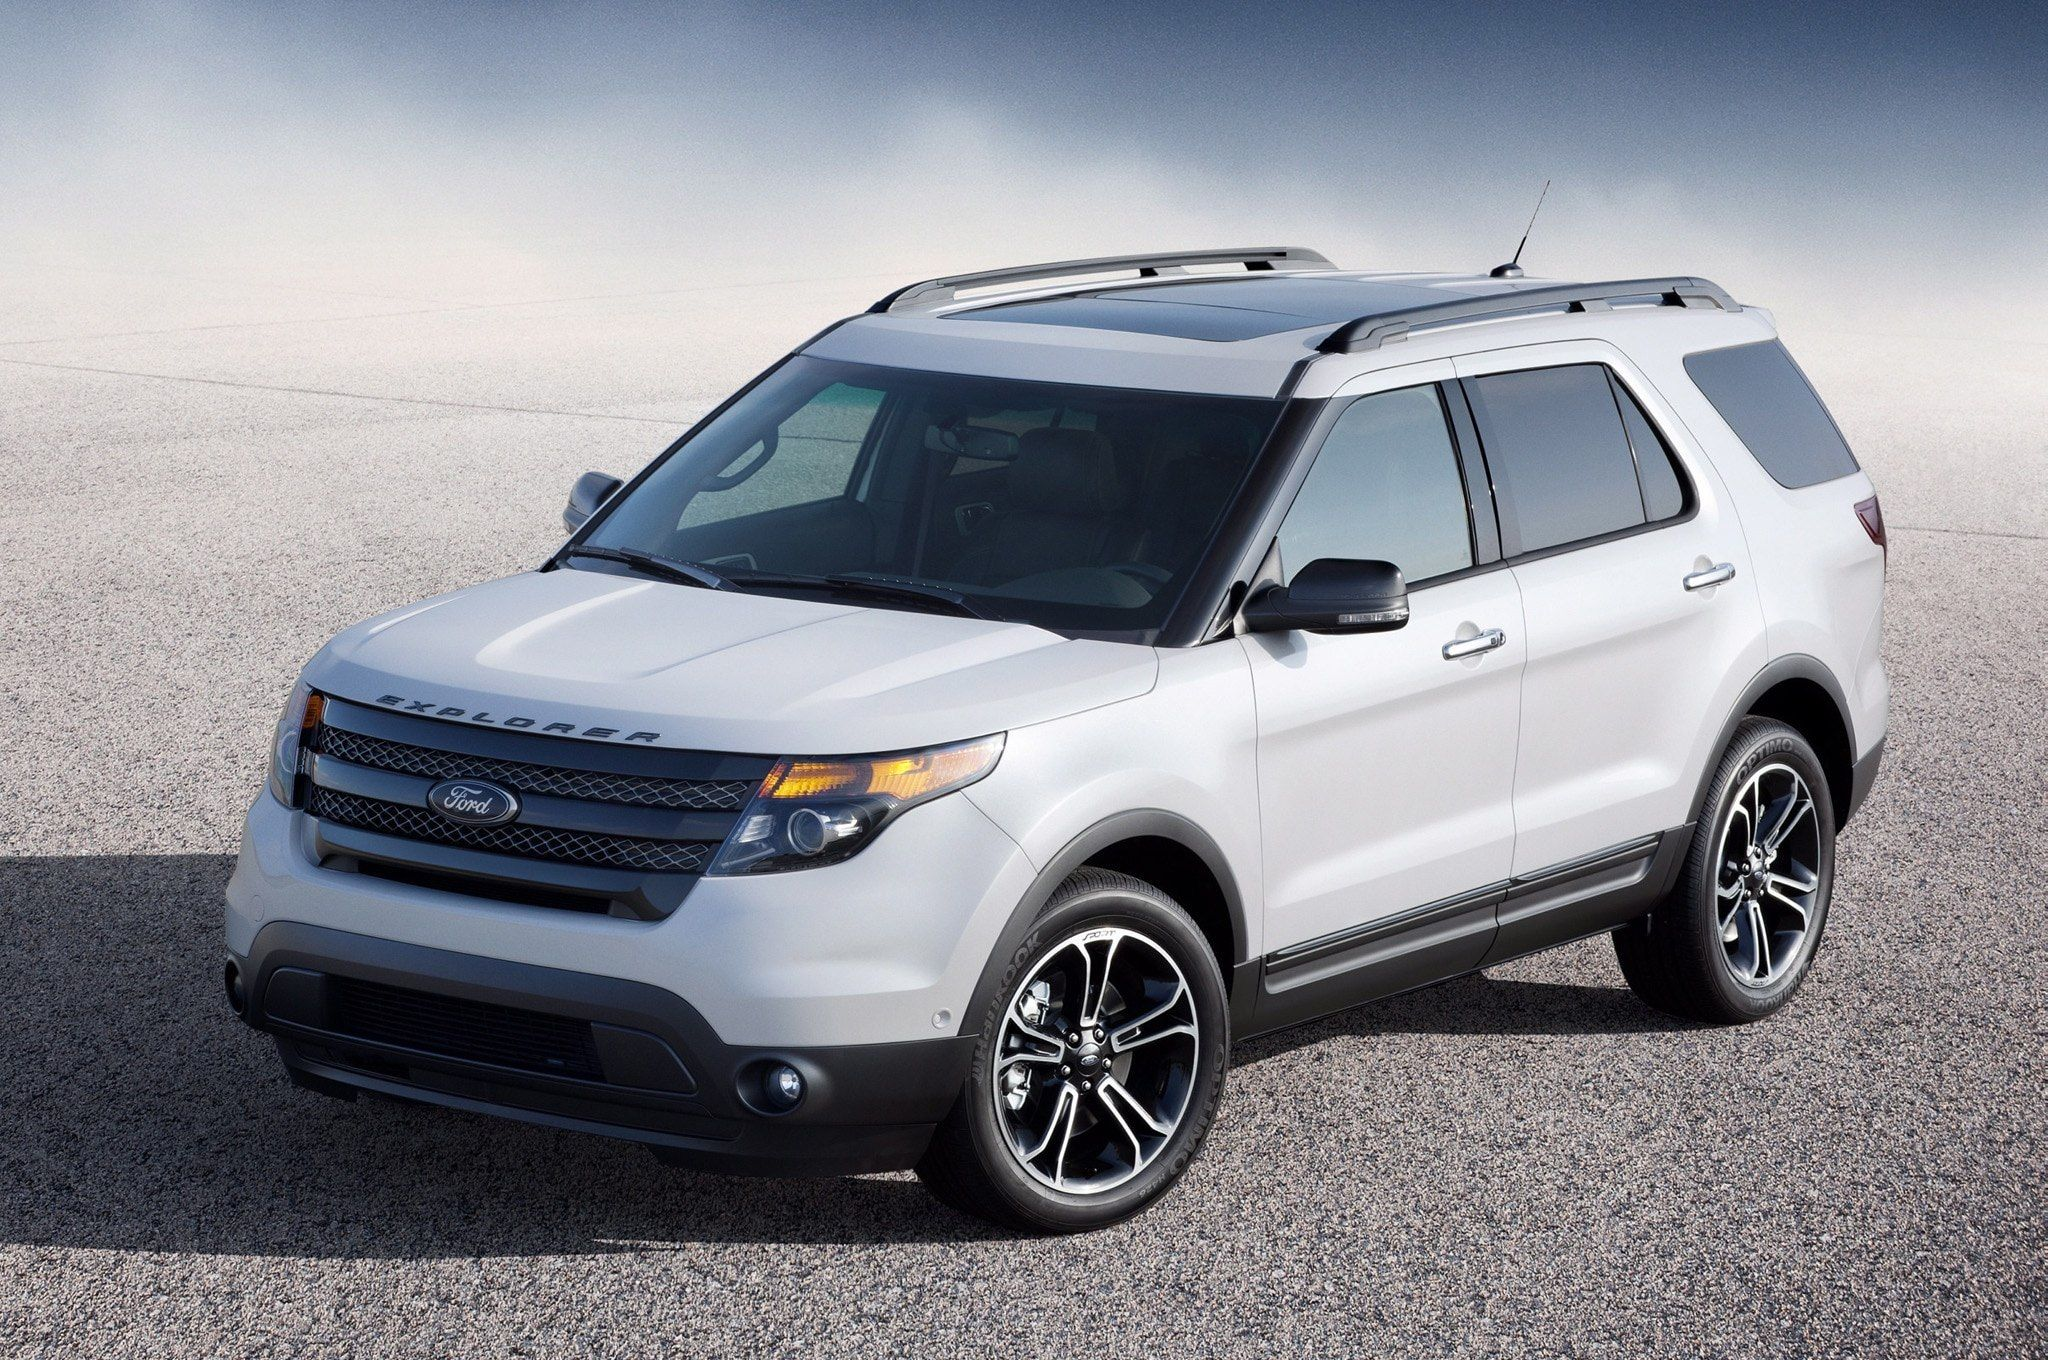 2013 Ford Explorer Xlt Towing Capacity http//carenara